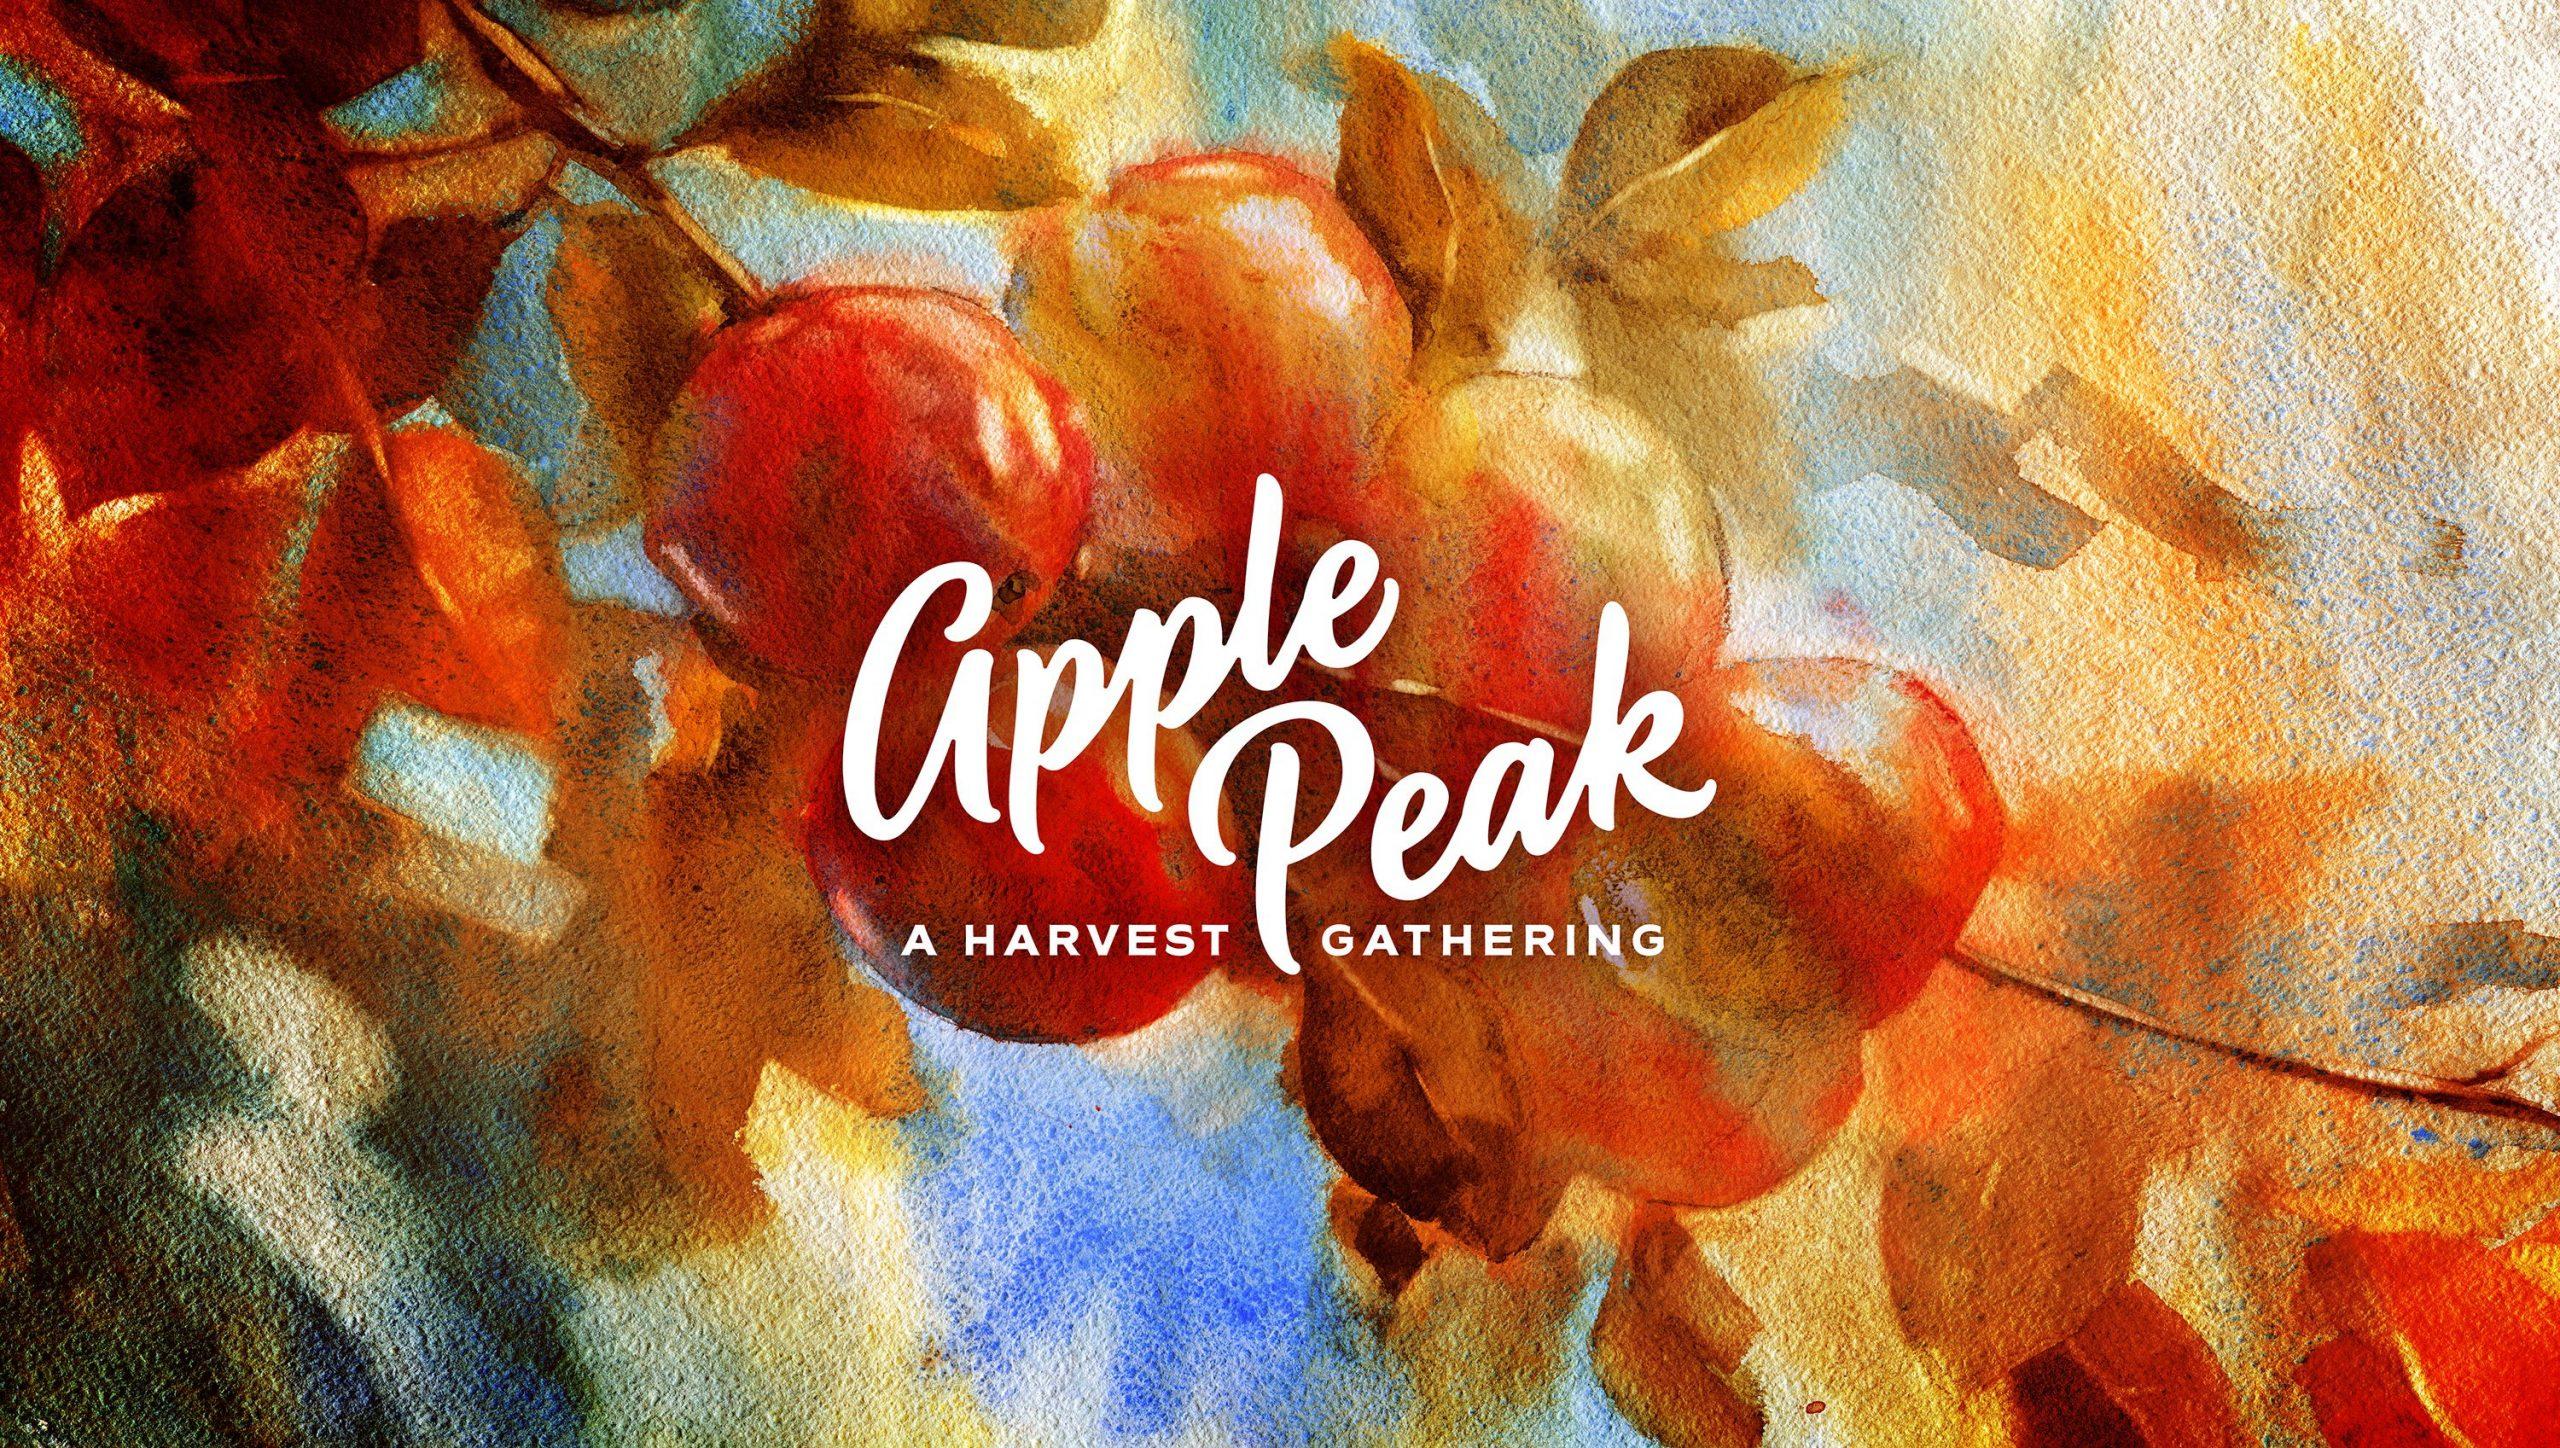 Apple Peak Market Erie County Farms Market Schedule